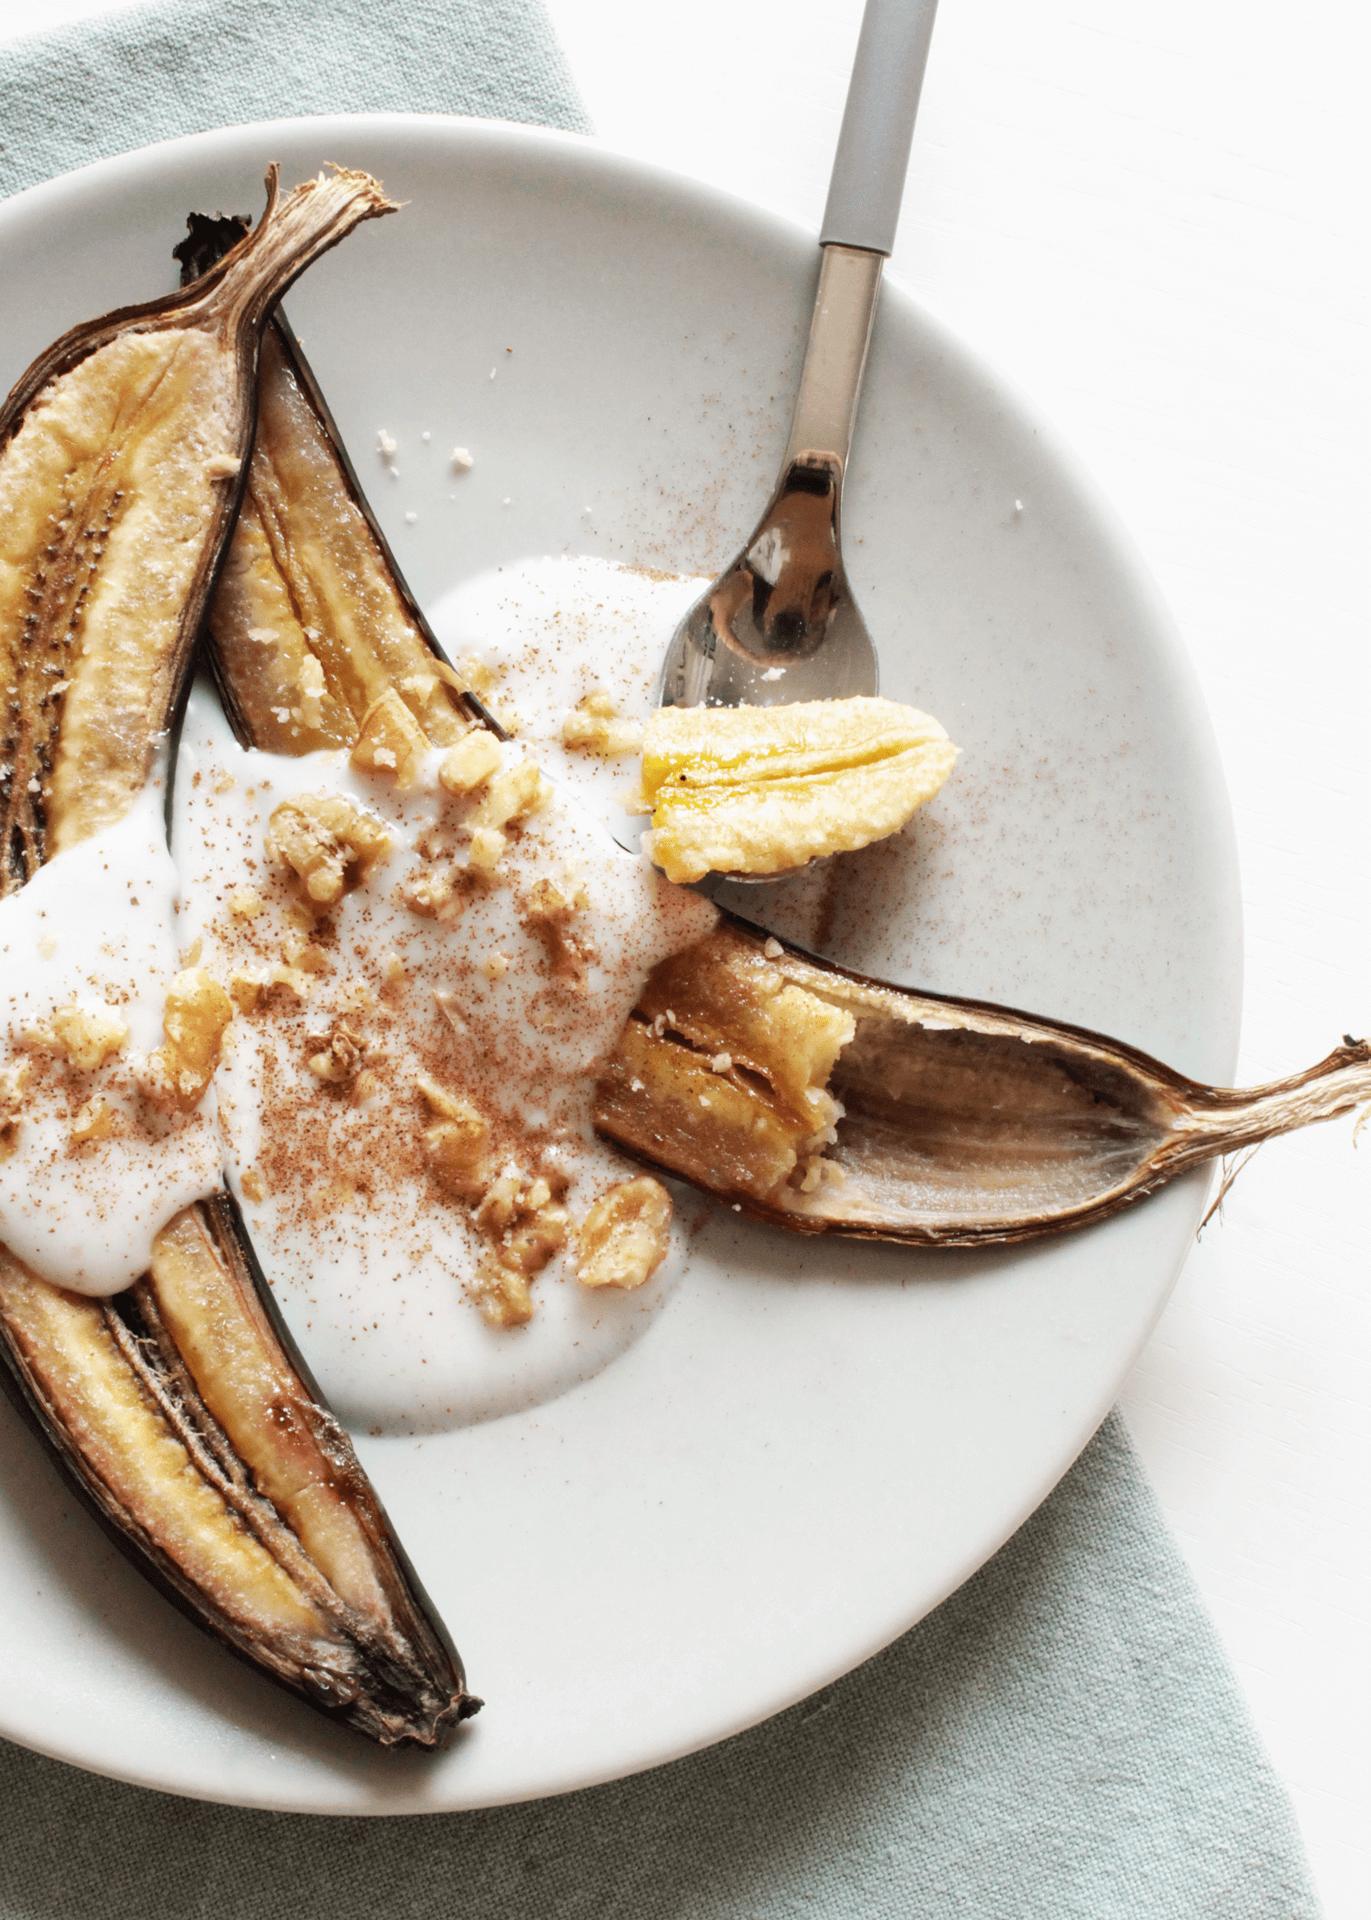 Banane, yogurt e noci